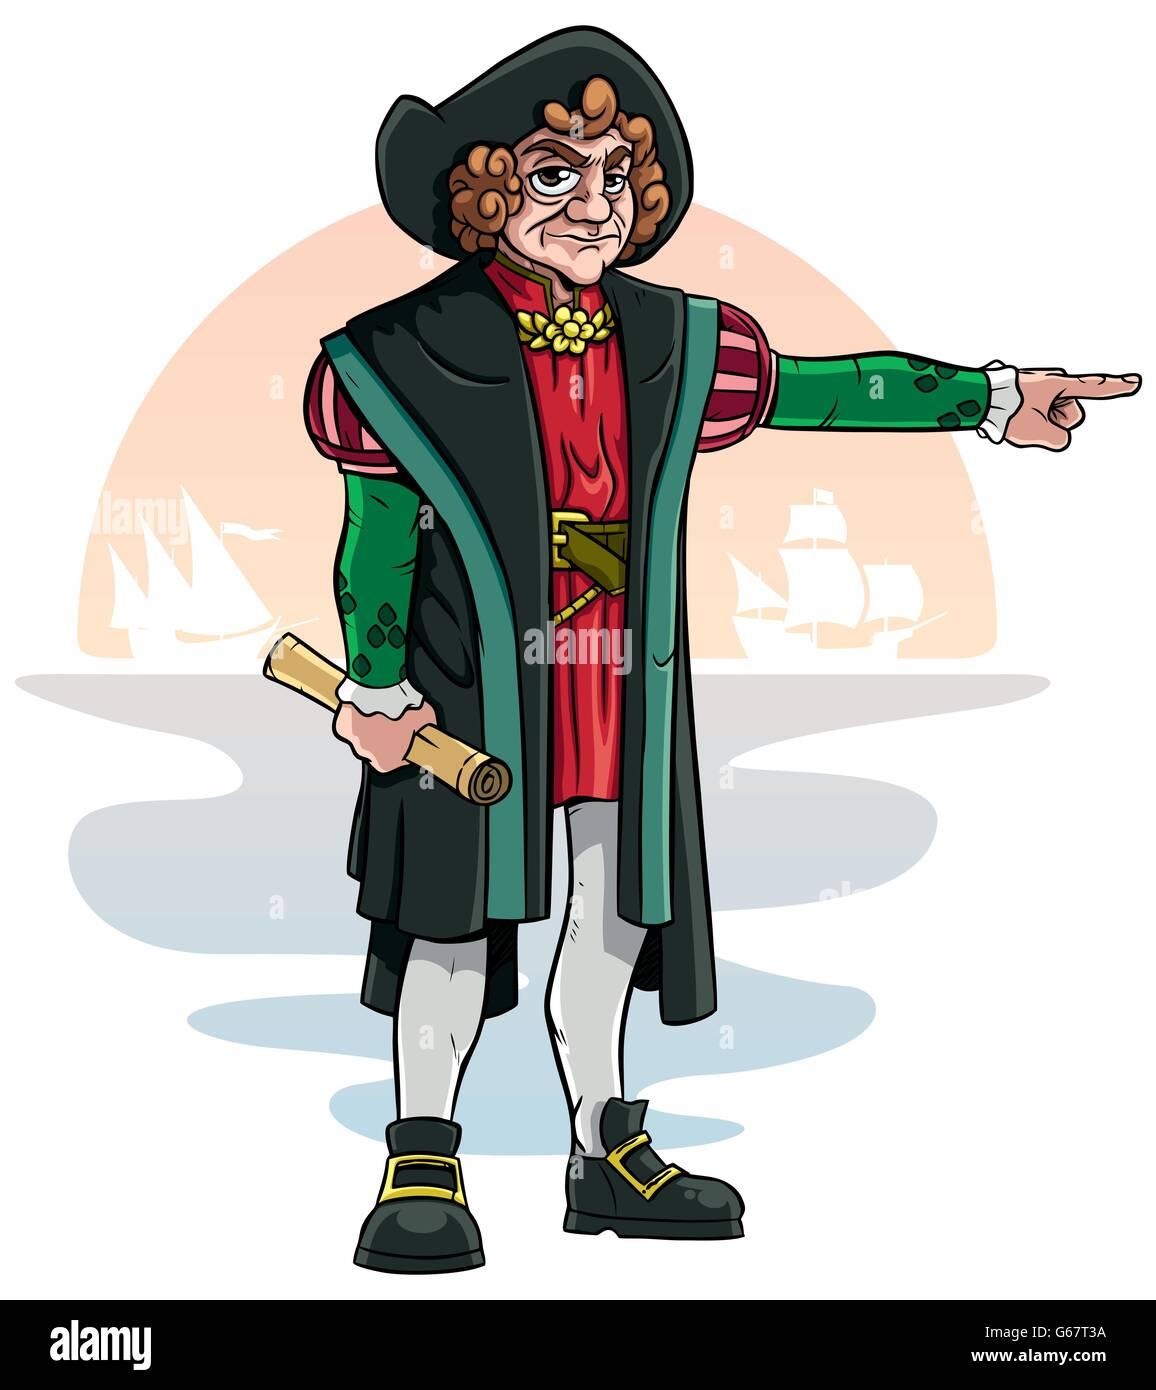 Cartoon Of Christopher Columbus Stock Vector Image Art Alamy